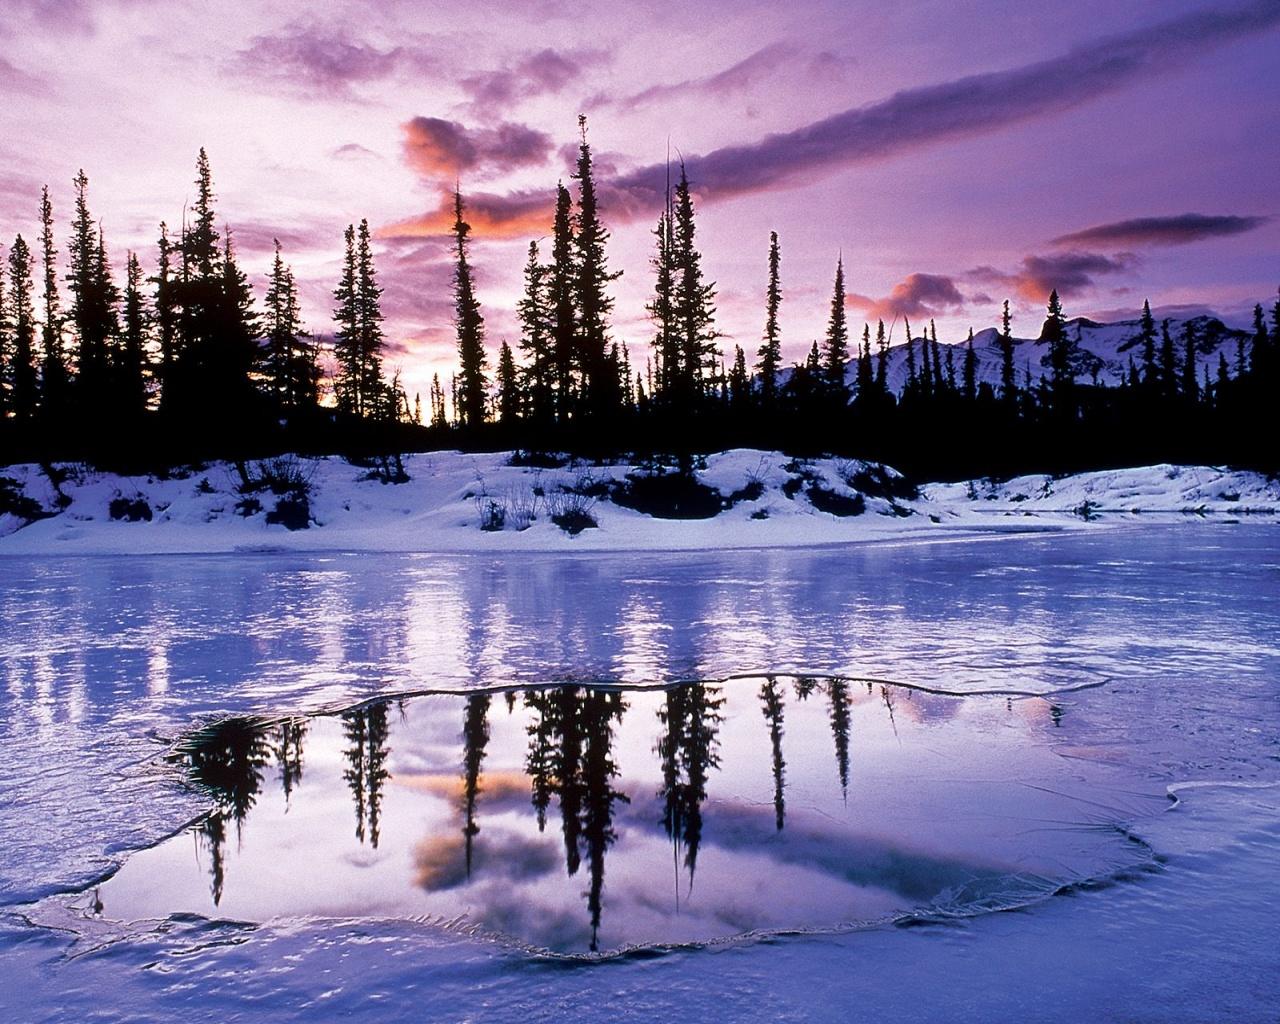 http://4.bp.blogspot.com/--pne6o6c92c/TkdMGMblZQI/AAAAAAAAAF4/v7x6y2Iv-QU/s1600/winter-desktop-wallpapers.jpg